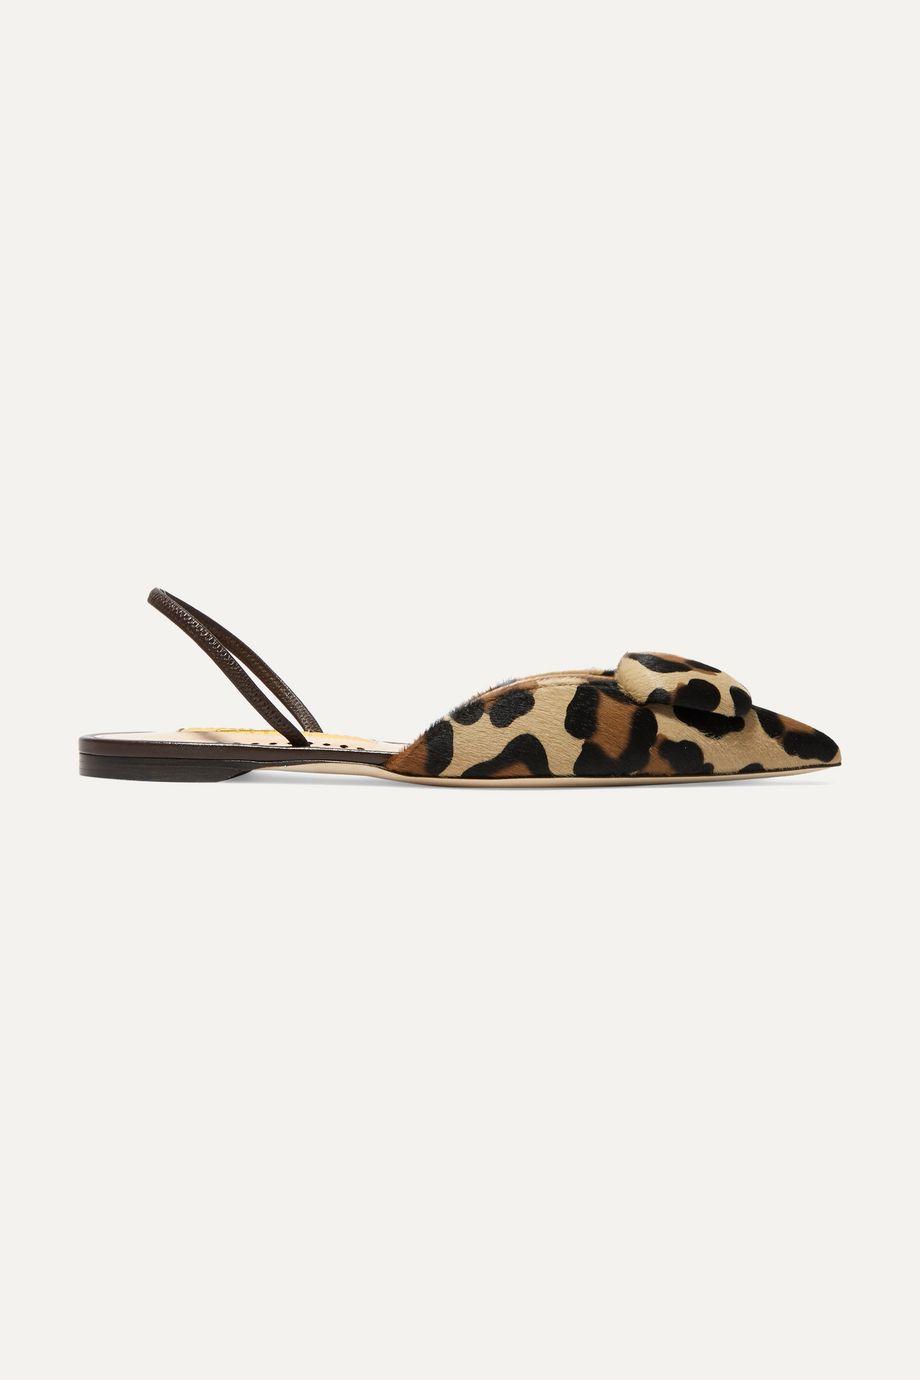 Rupert Sanderson Sabine leopard-print calf hair slingback flats